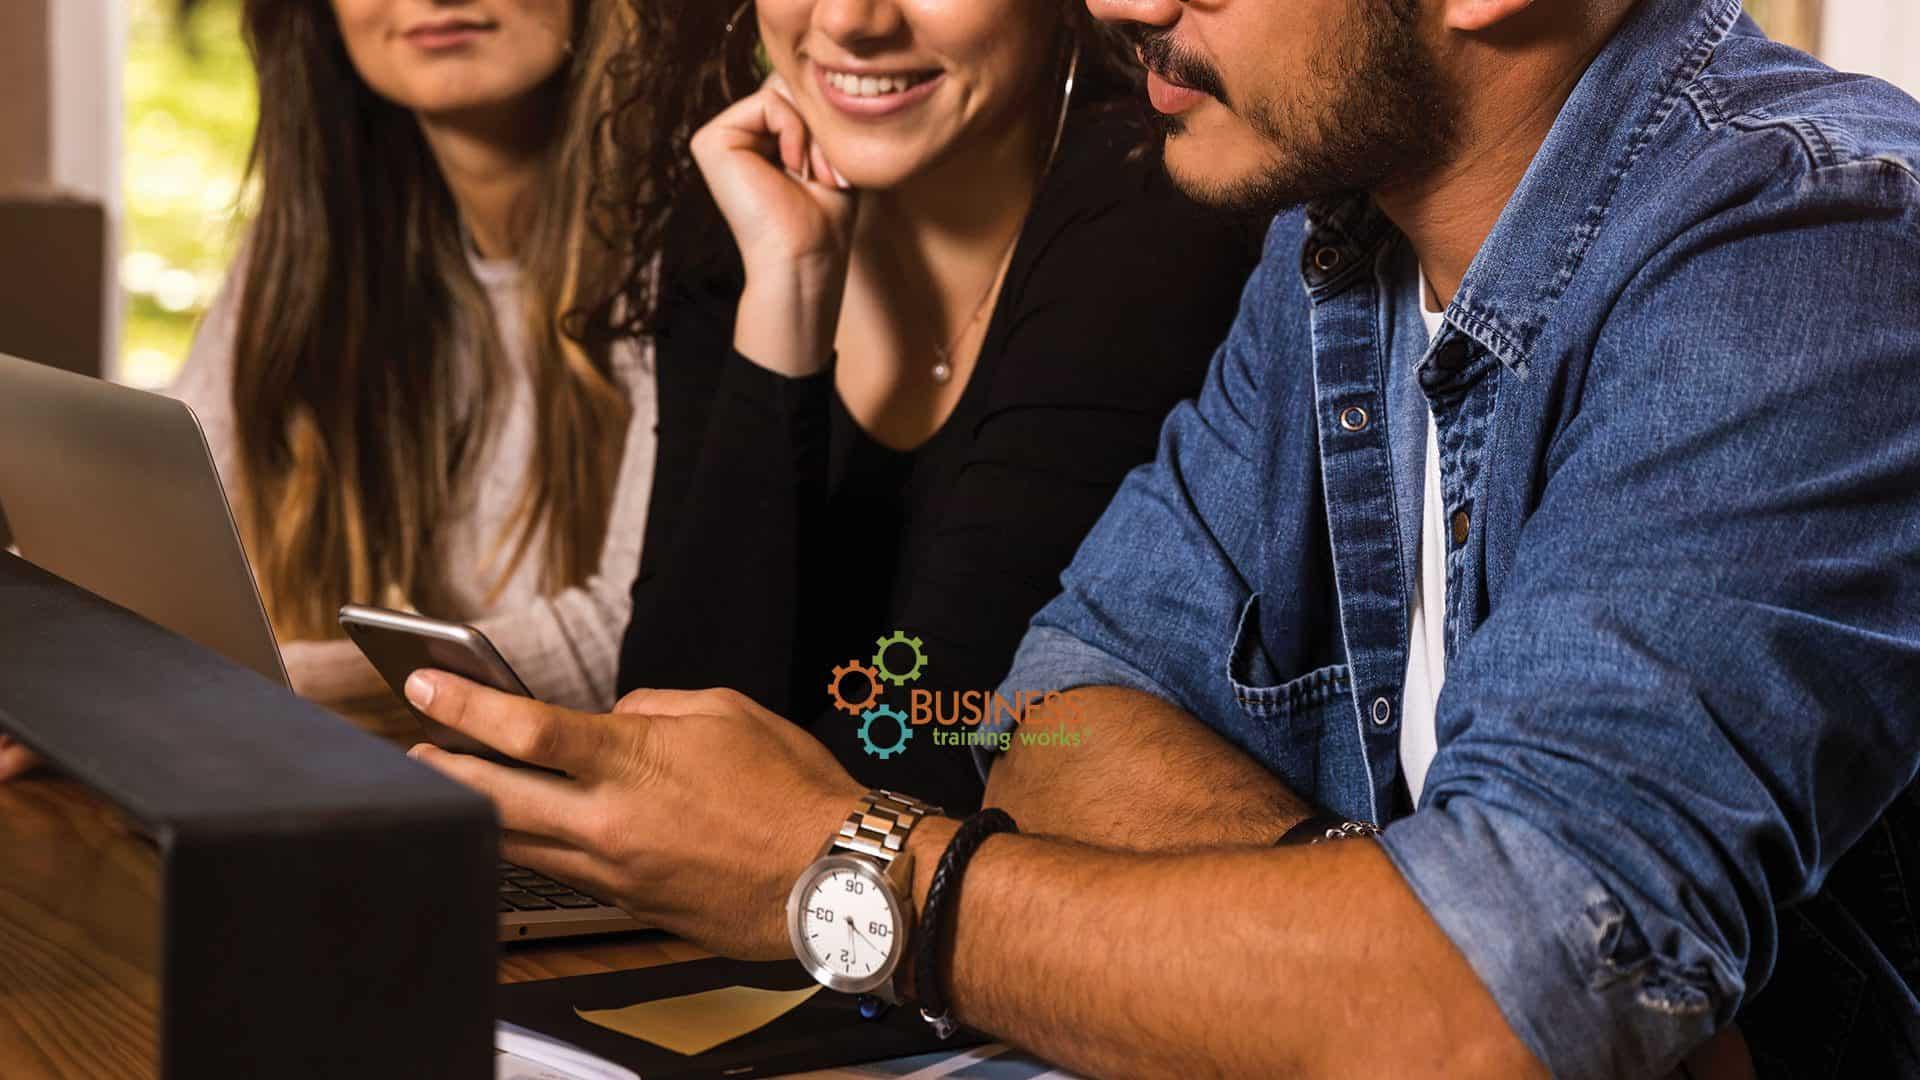 Web-Based Presentation Skills Programs